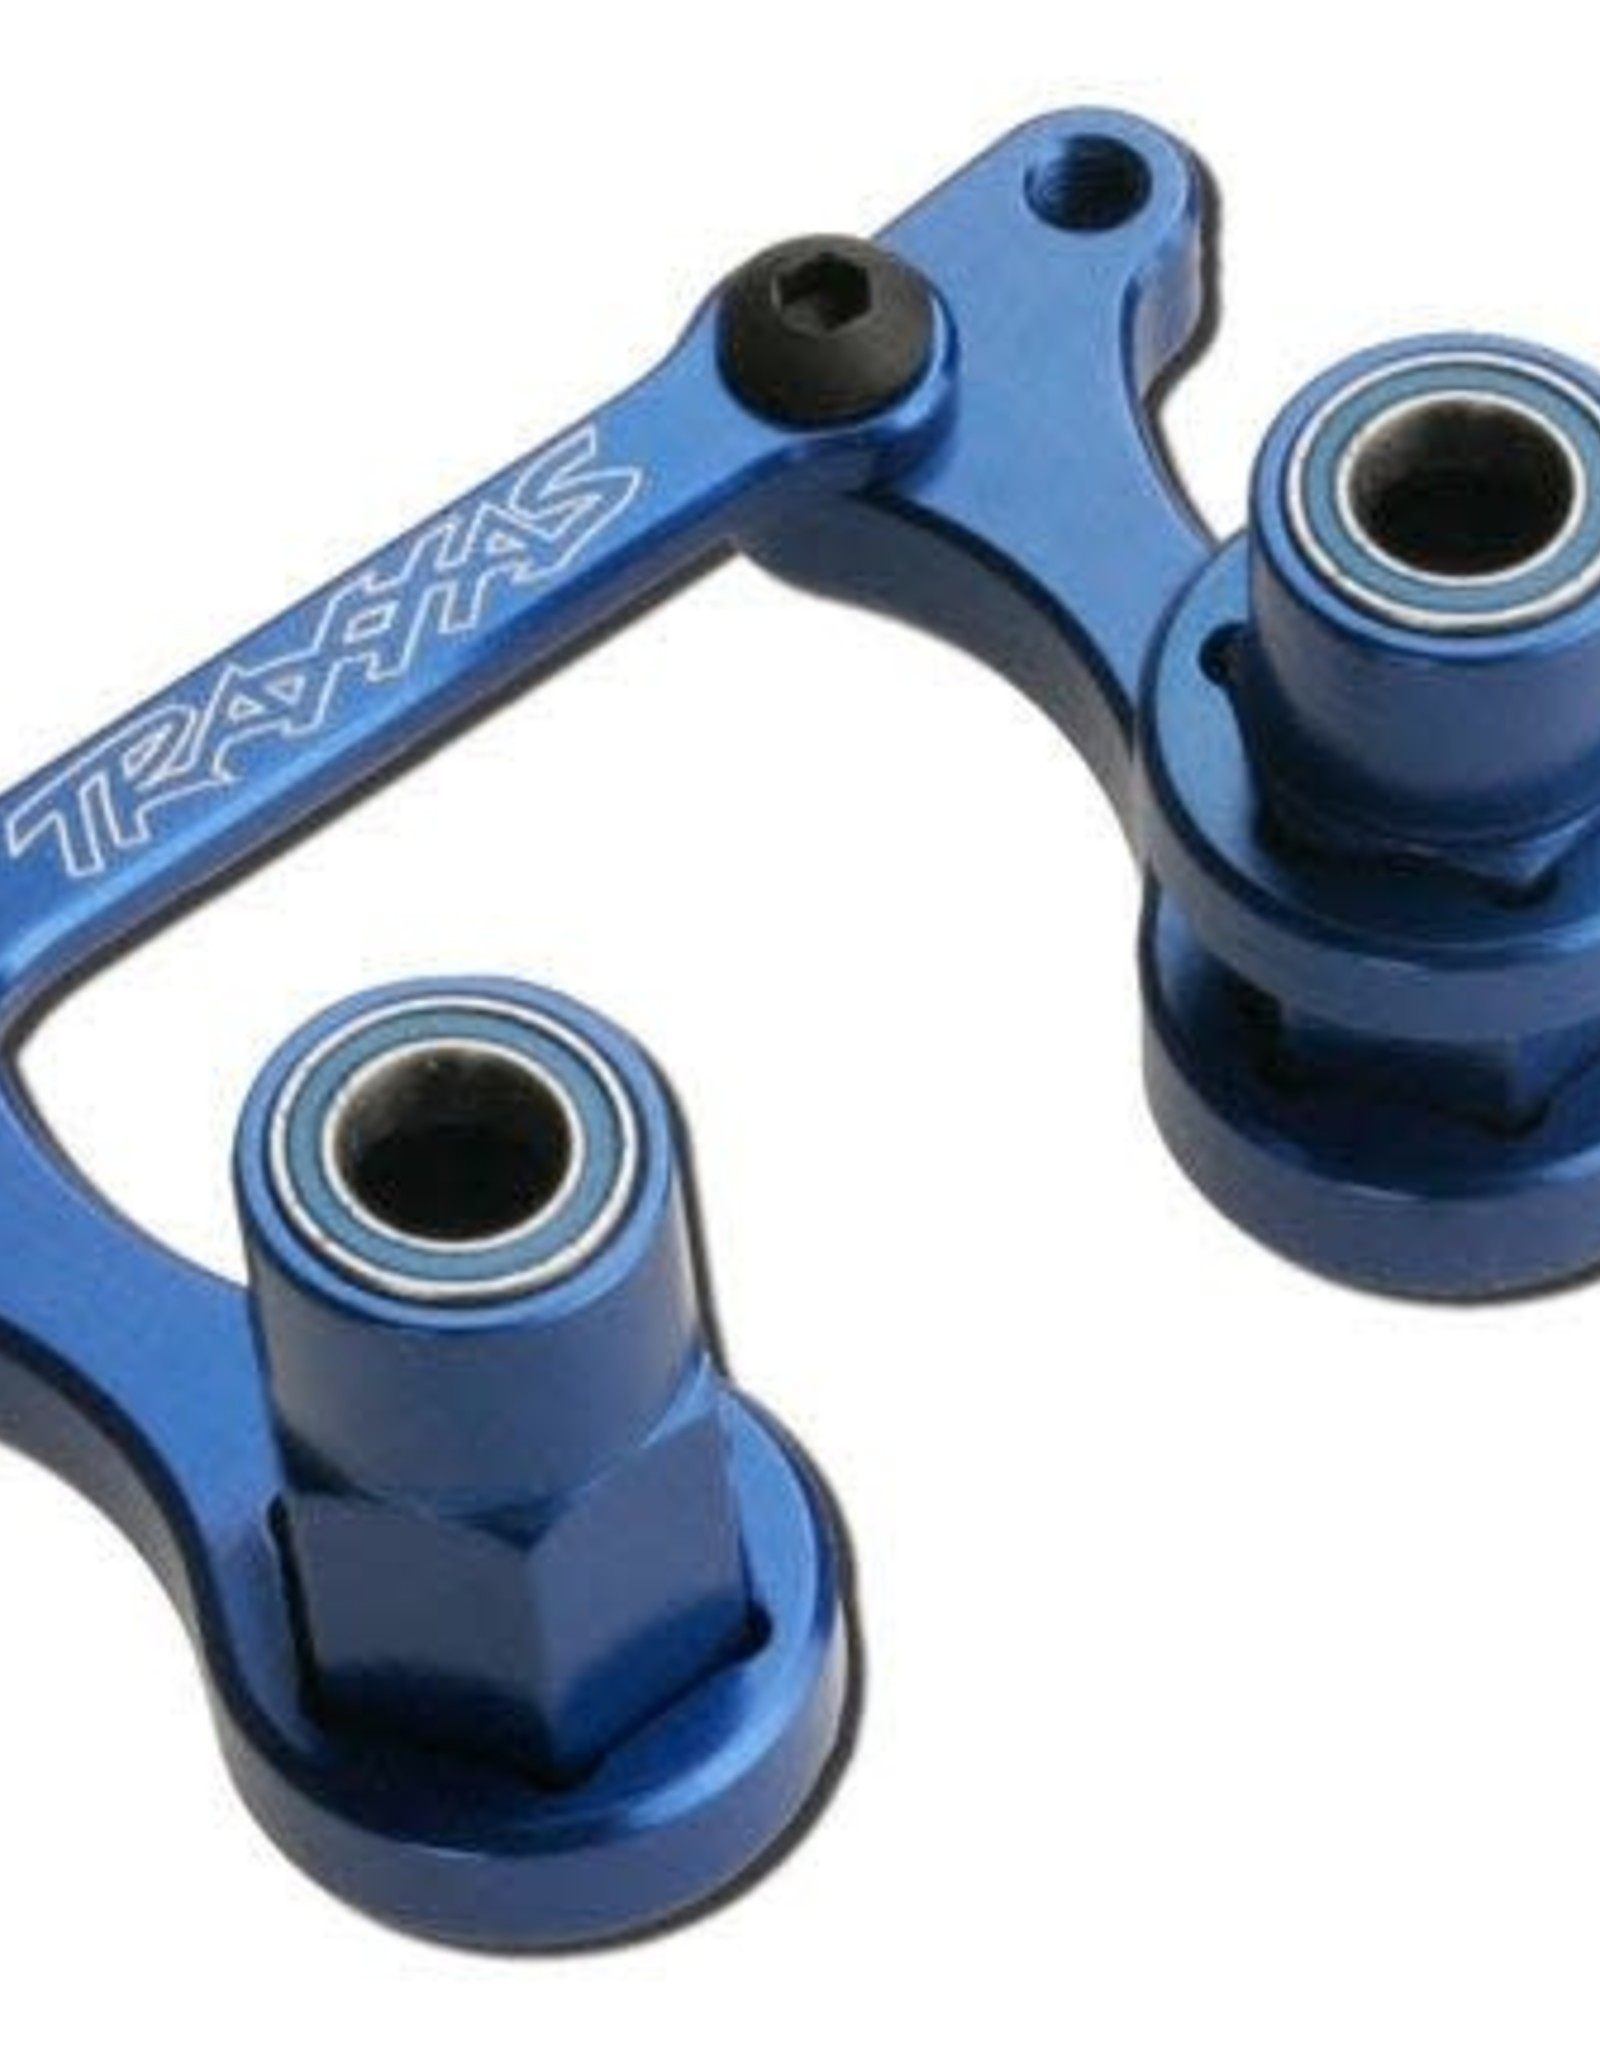 TRAXXAS TRX3743A BELLCRANKS/DRAGLINK ALUM BLUE